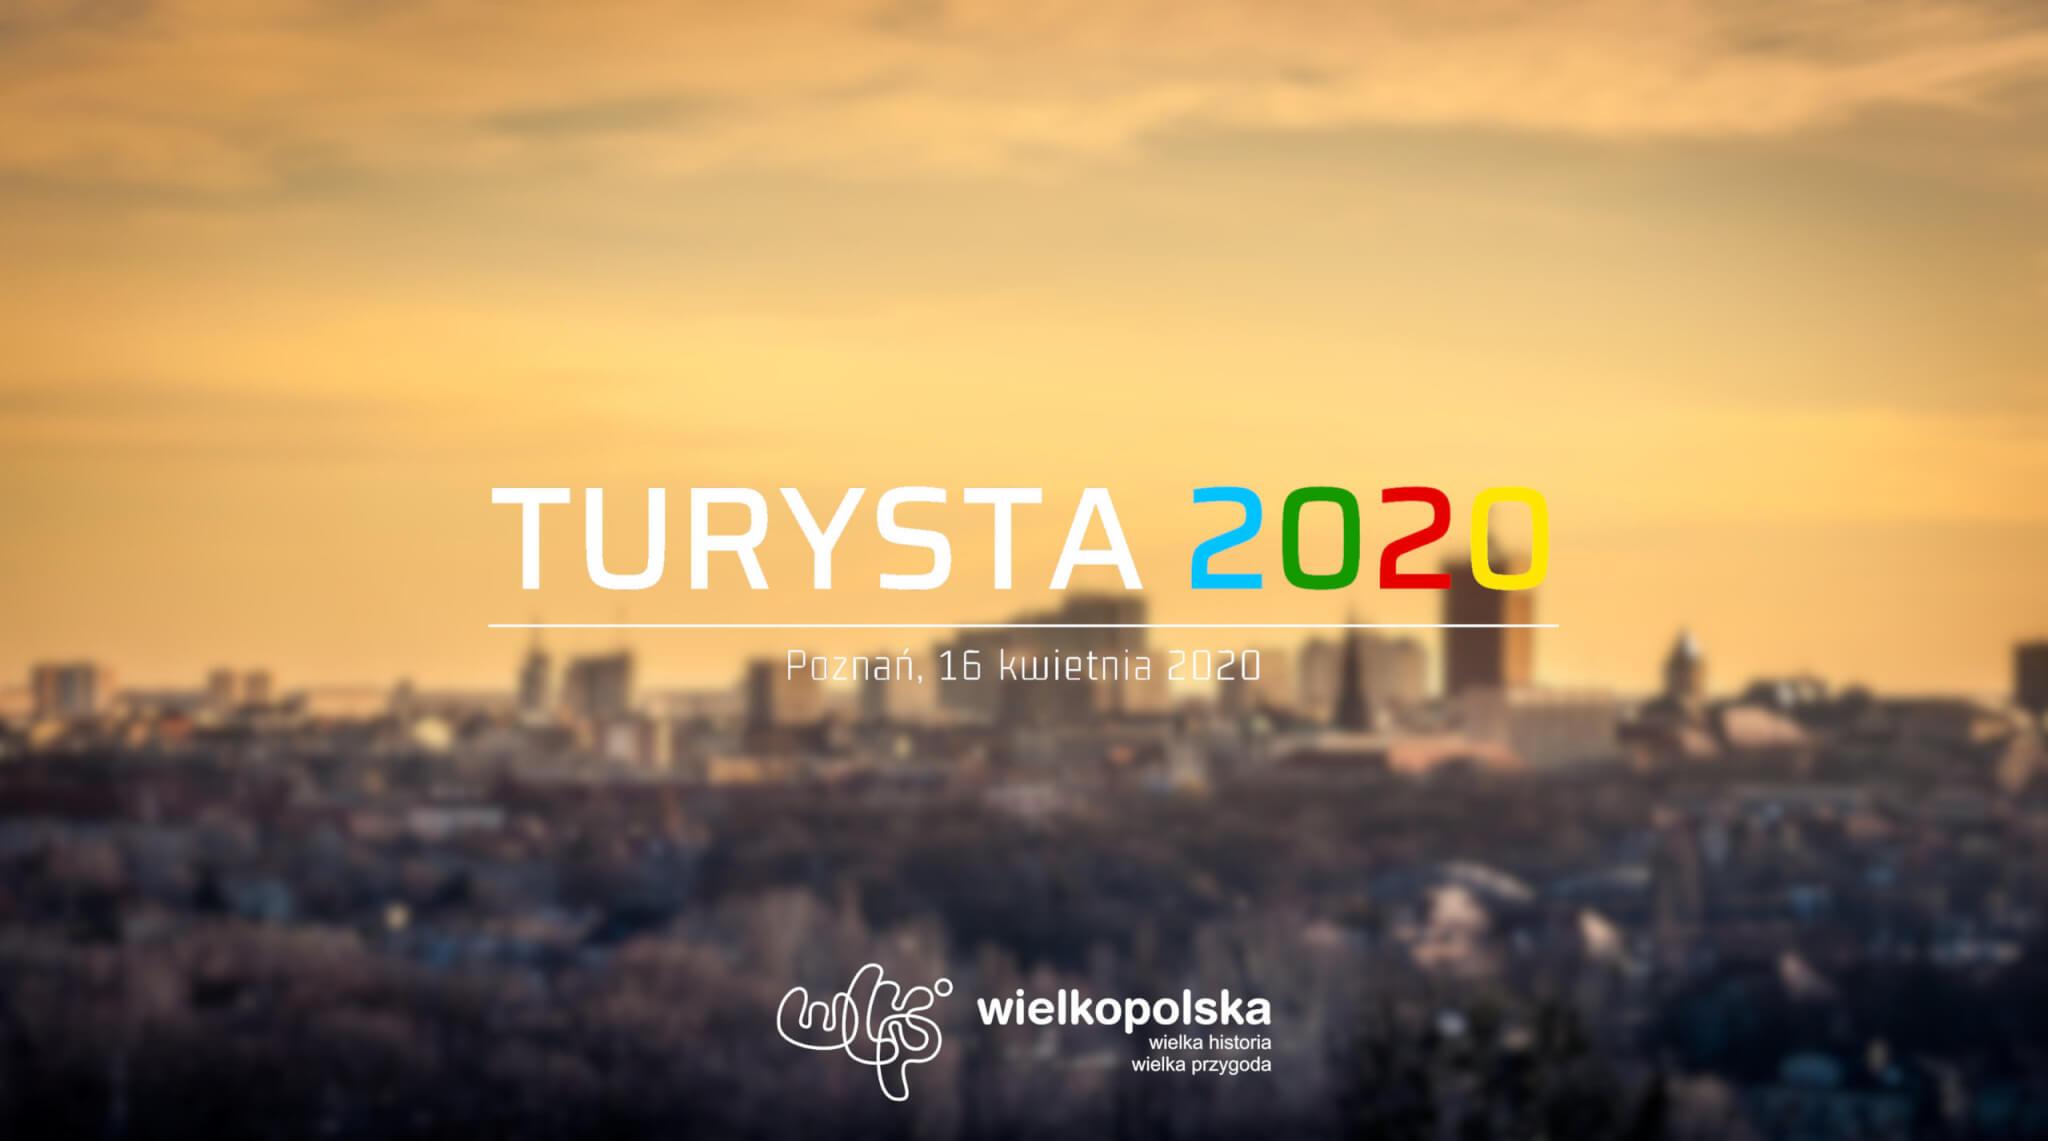 turysta 2020 baner